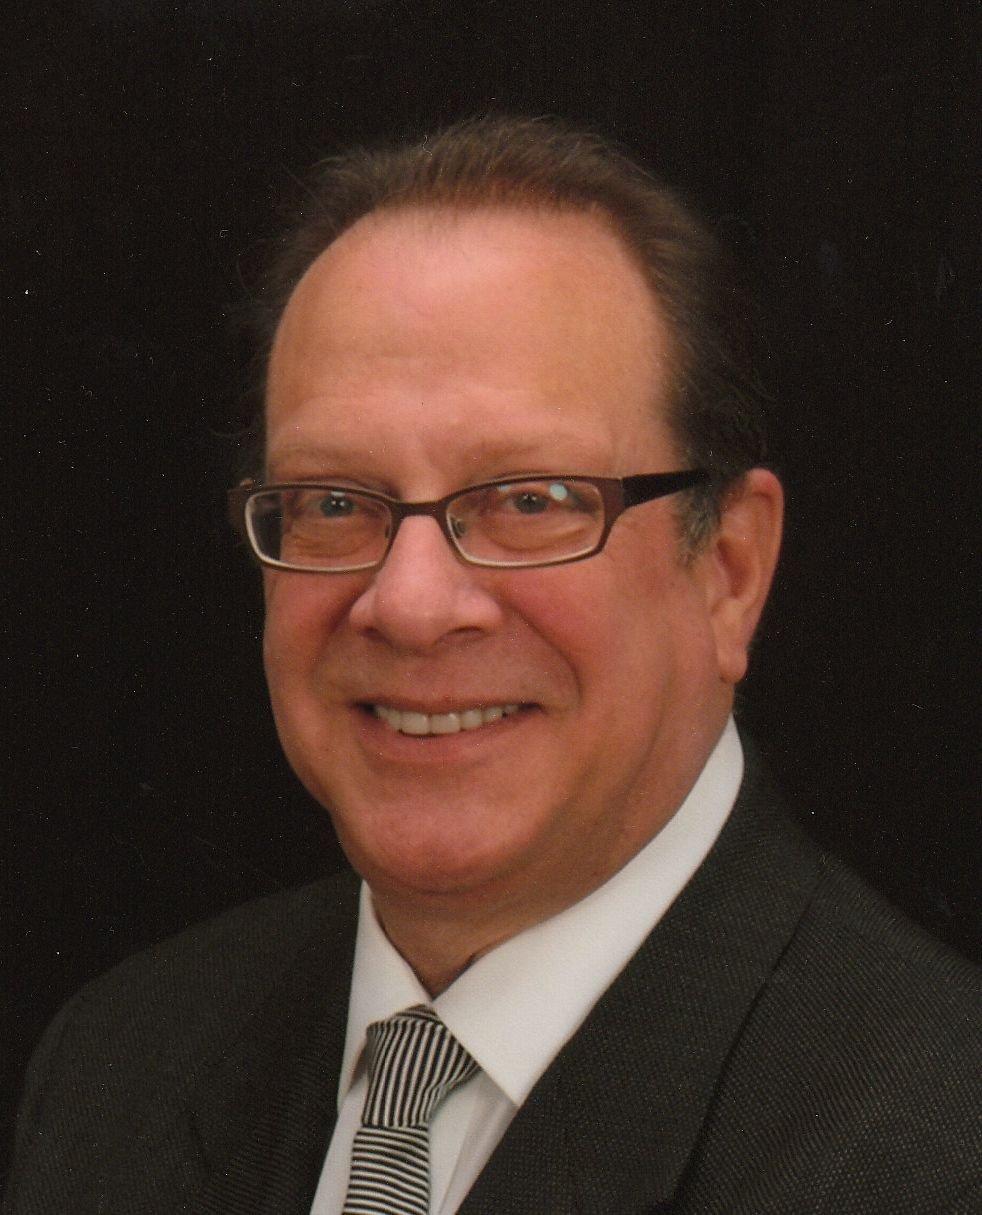 Steve Borstein